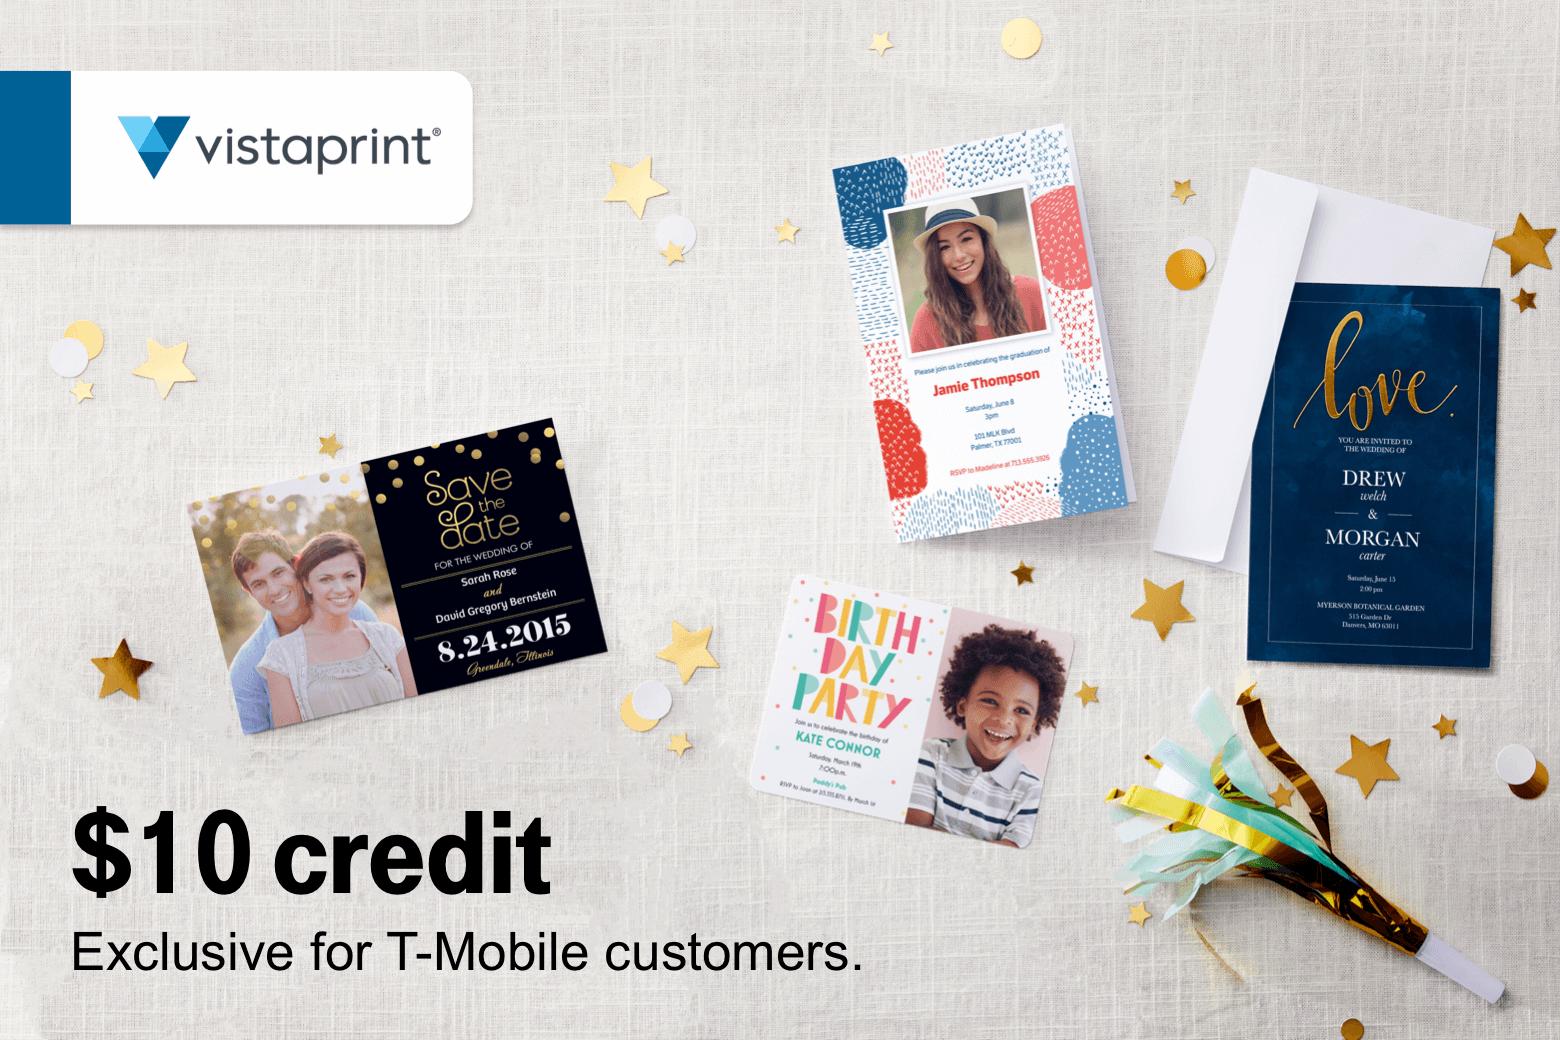 T Mobile Customers 0611 Free Phone Wallet Vistaprint 10 Credit